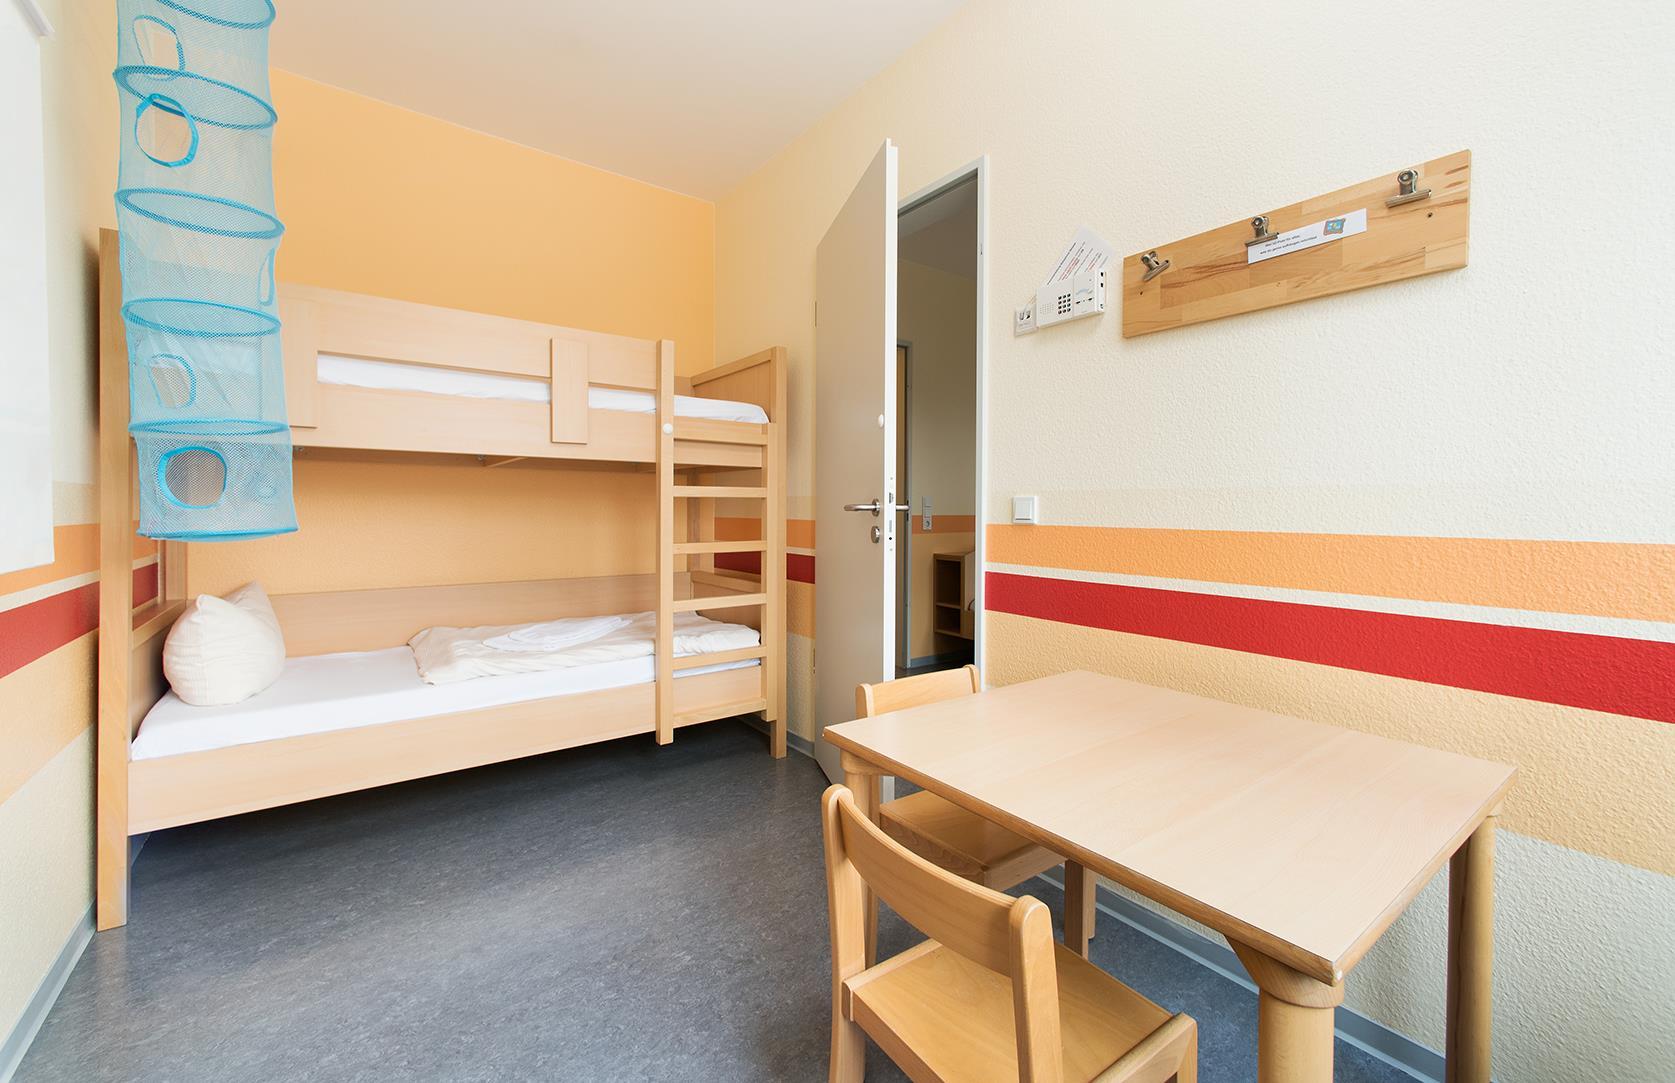 Die Apartments Caritas Westfalenhaus Mutter Kind Vorsorge Klinik